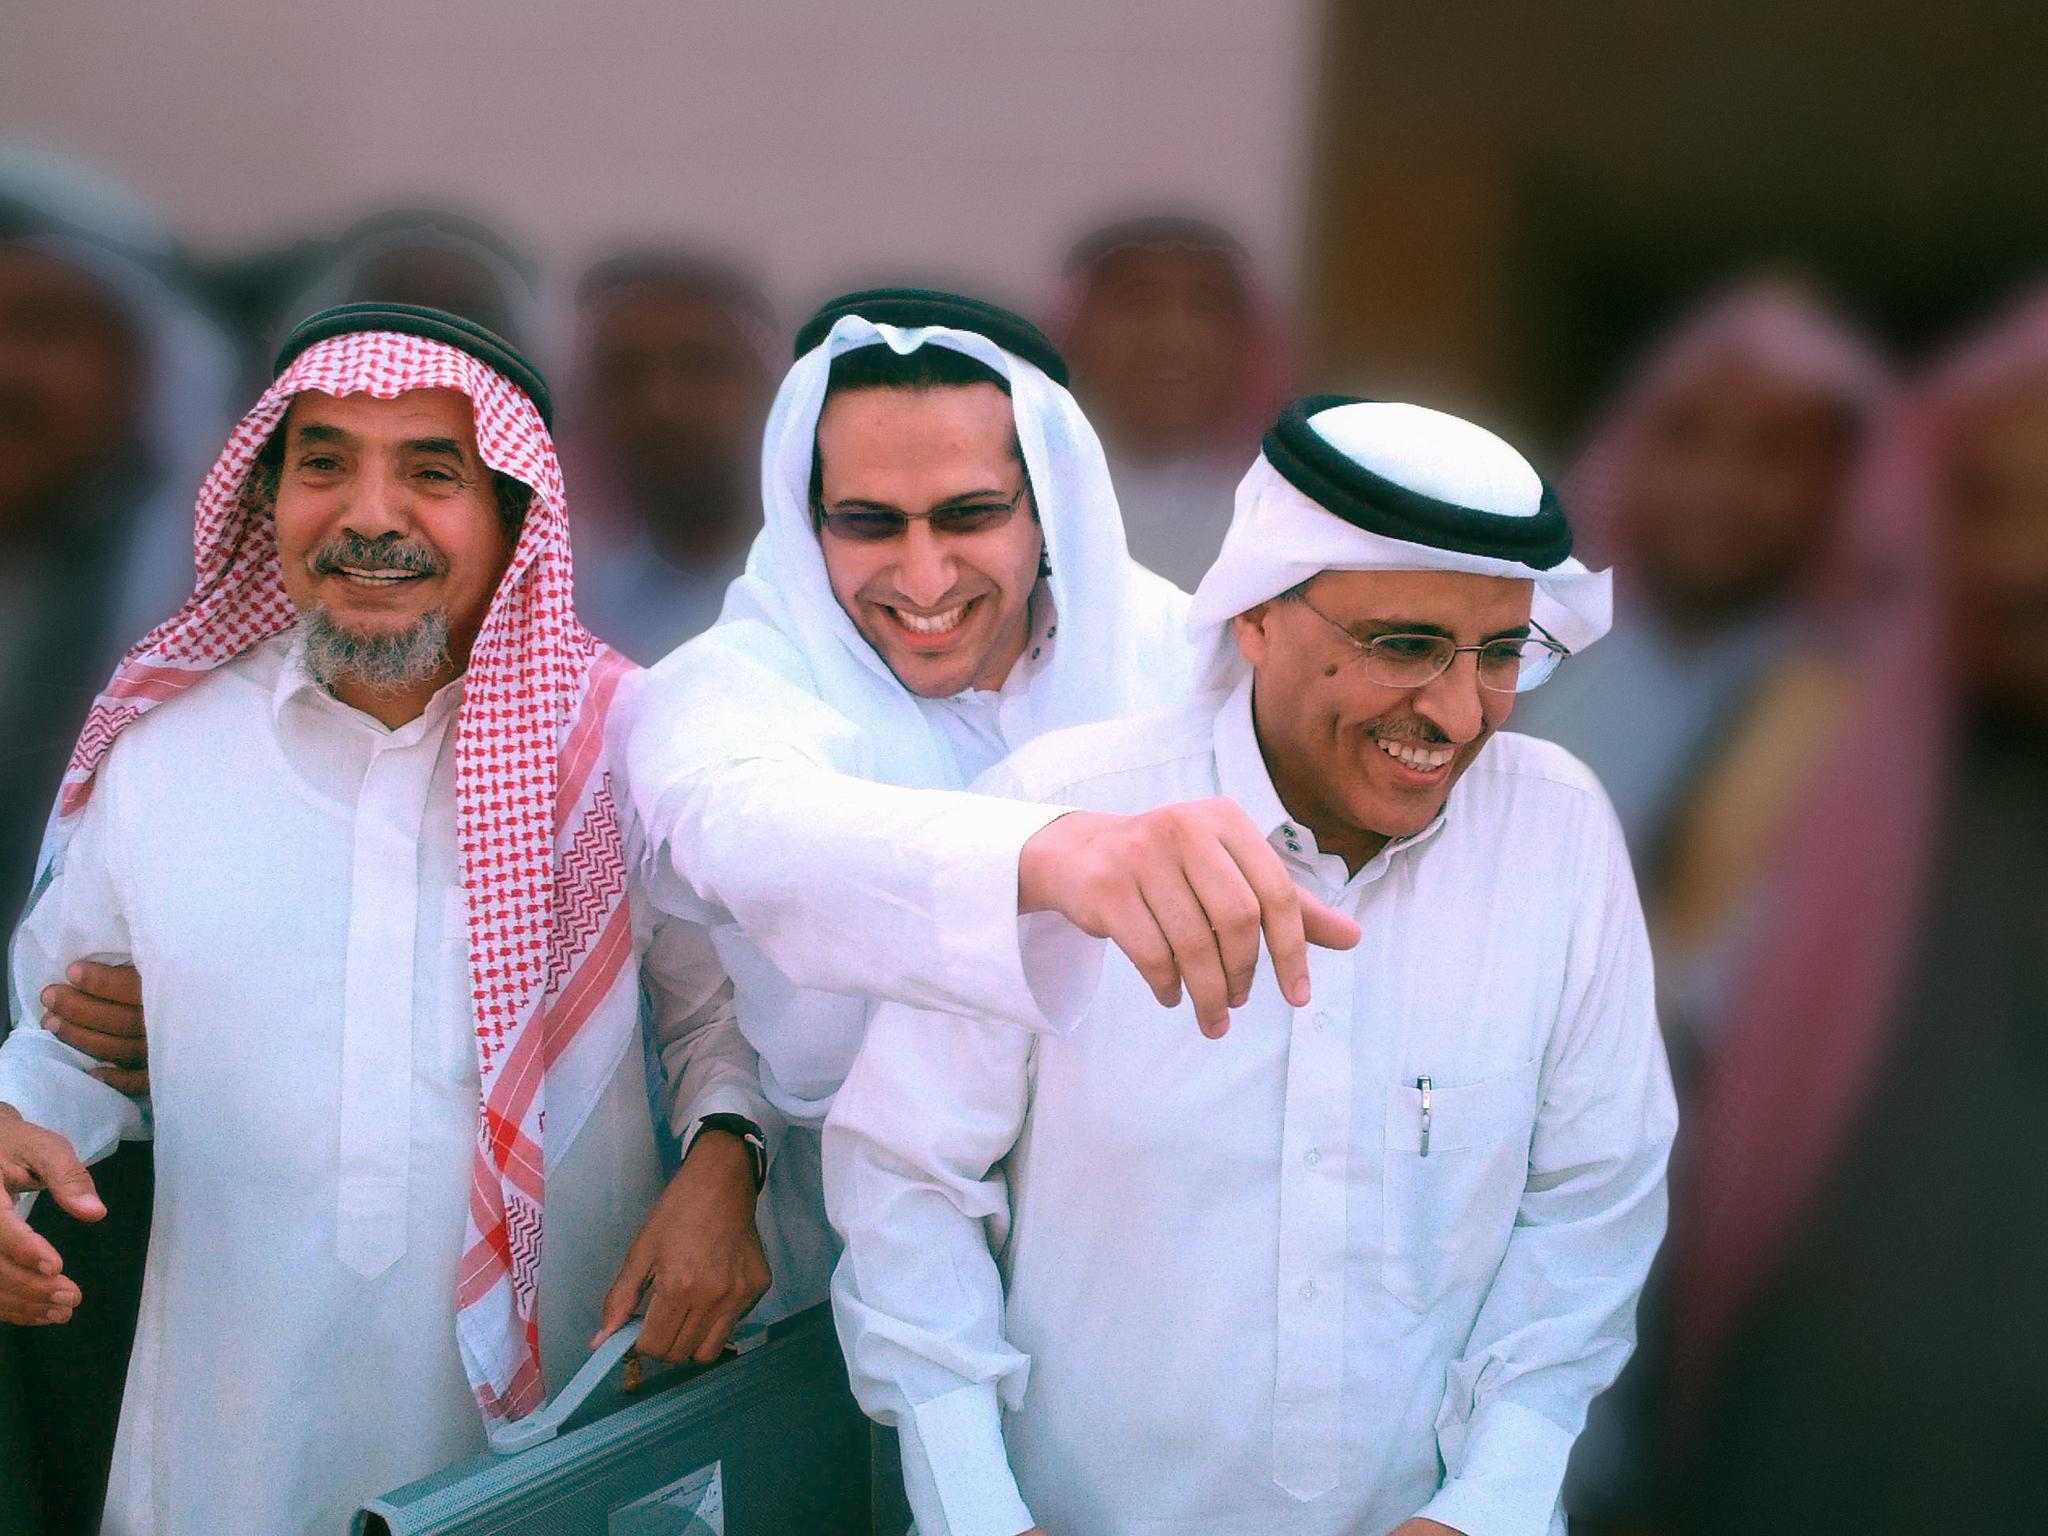 Los laureados Abdalá al Hamid, Mohamed Fahad al Qahtani y Walid Abu al Jair.